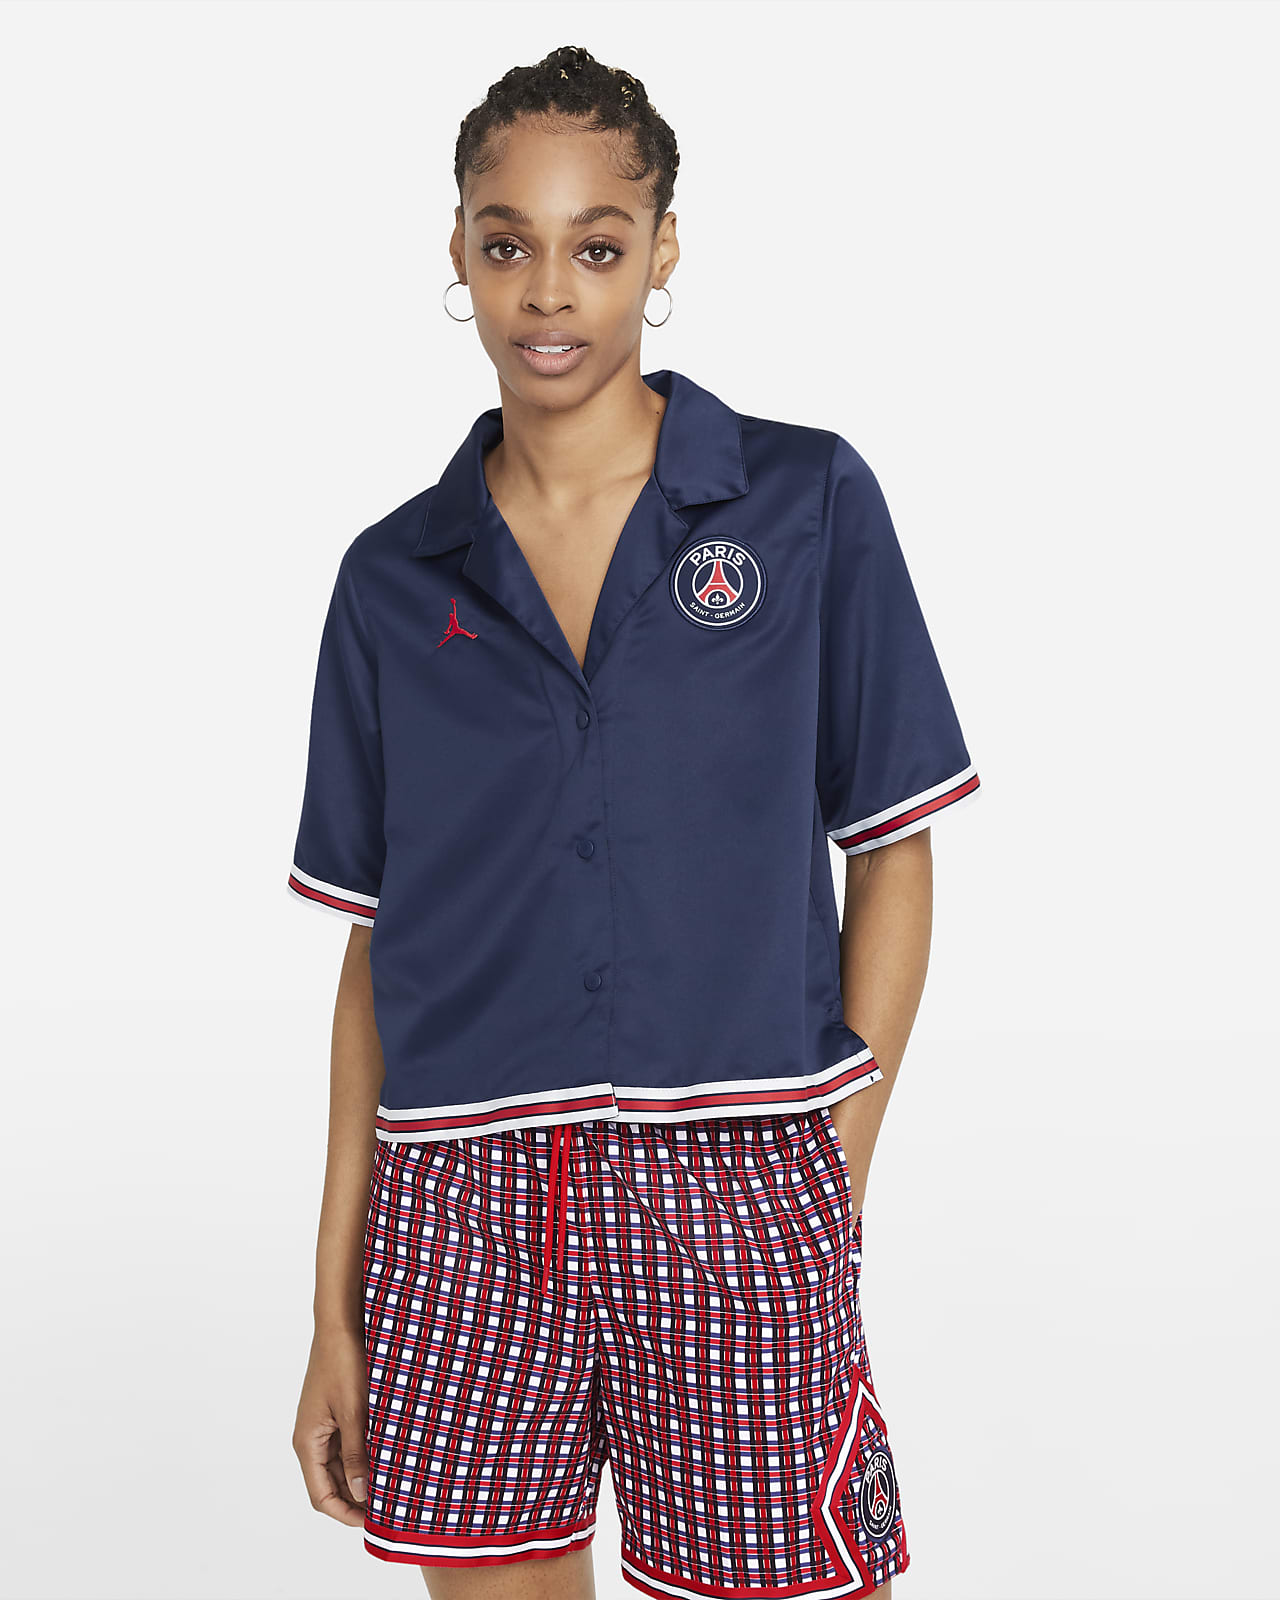 Prenda para la parte superior de manga corta lisa para mujer Paris Saint-Germain